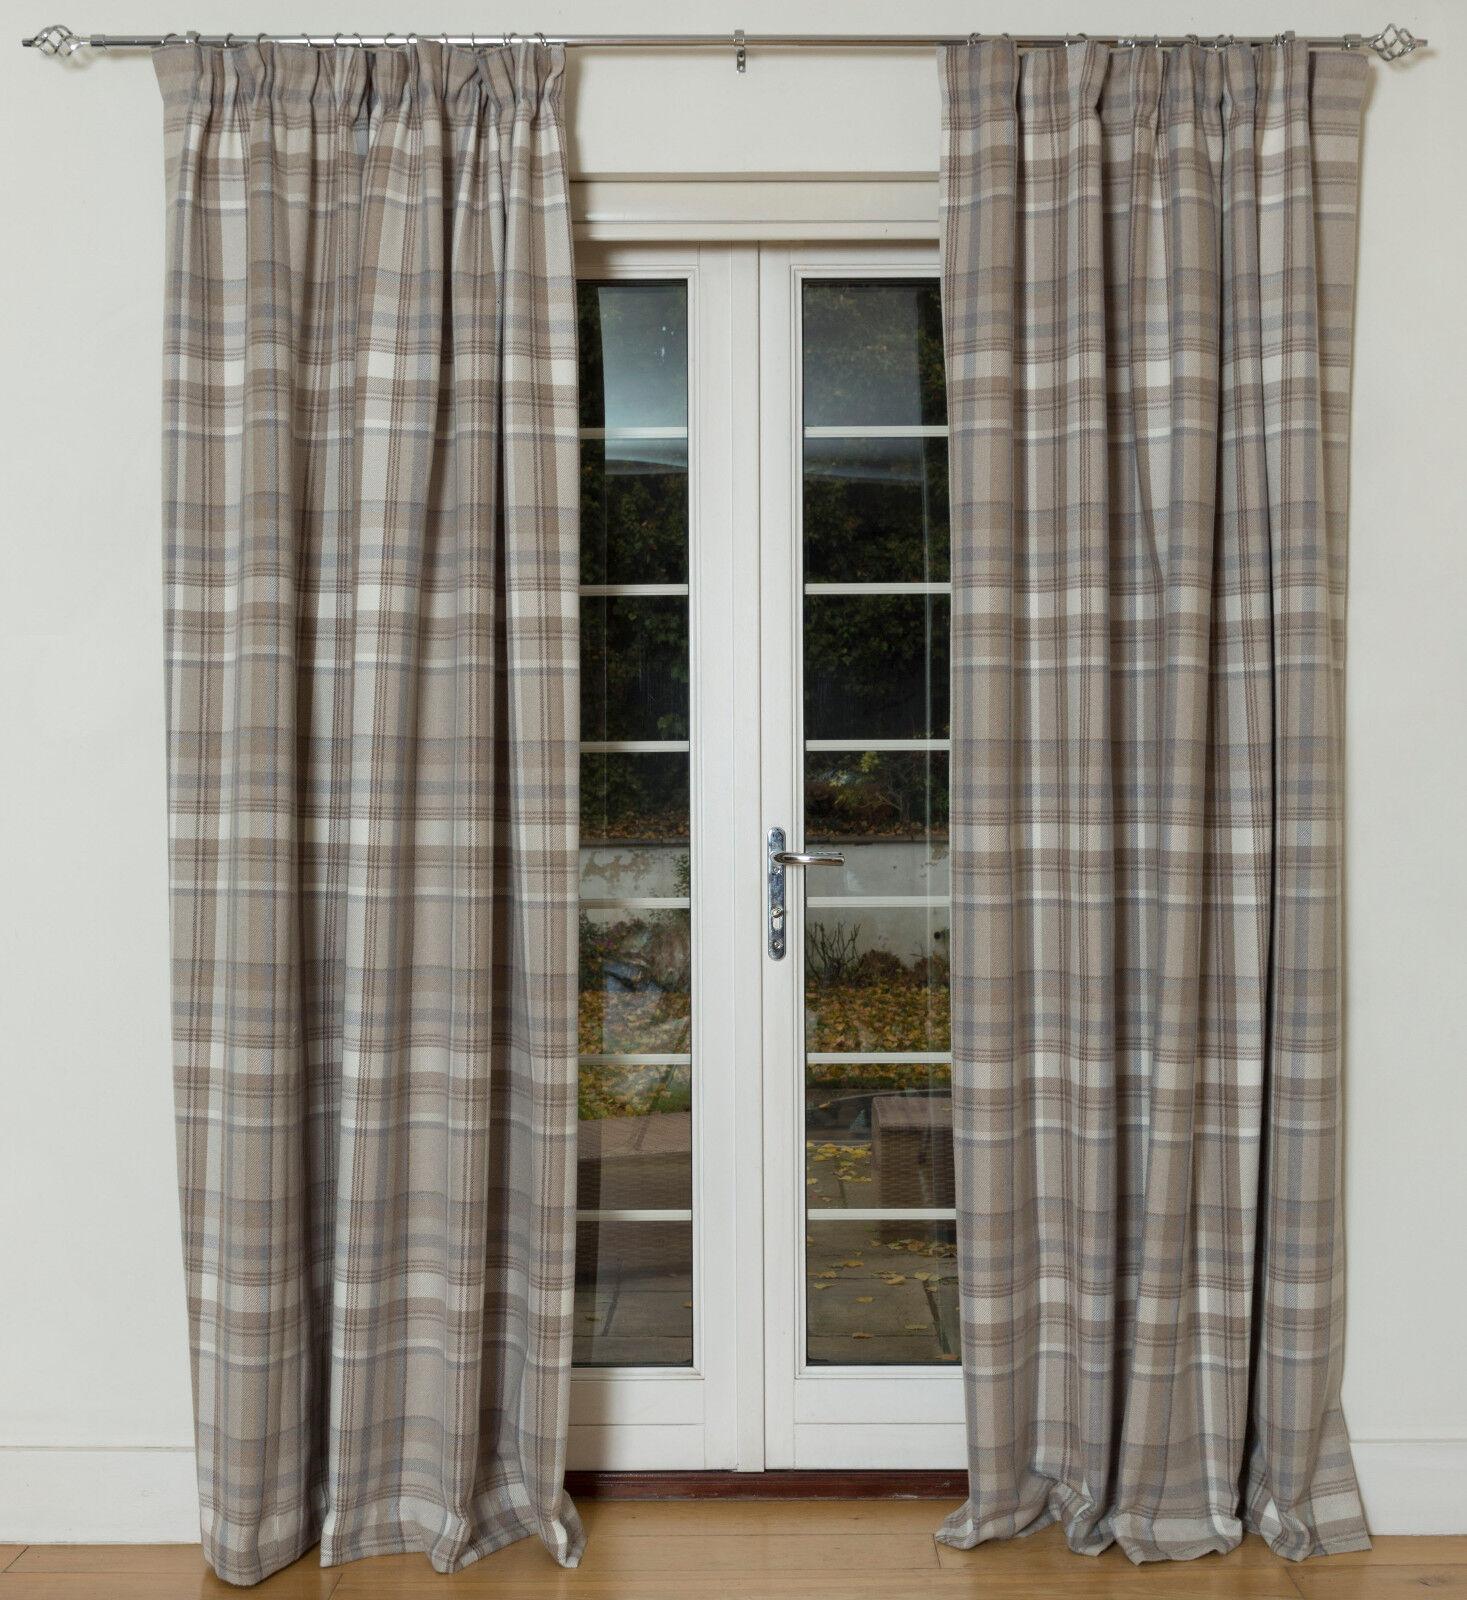 McAlister Textiles heritage Lana Beige Naturale Sensazione Tartan Check Curtain coppia